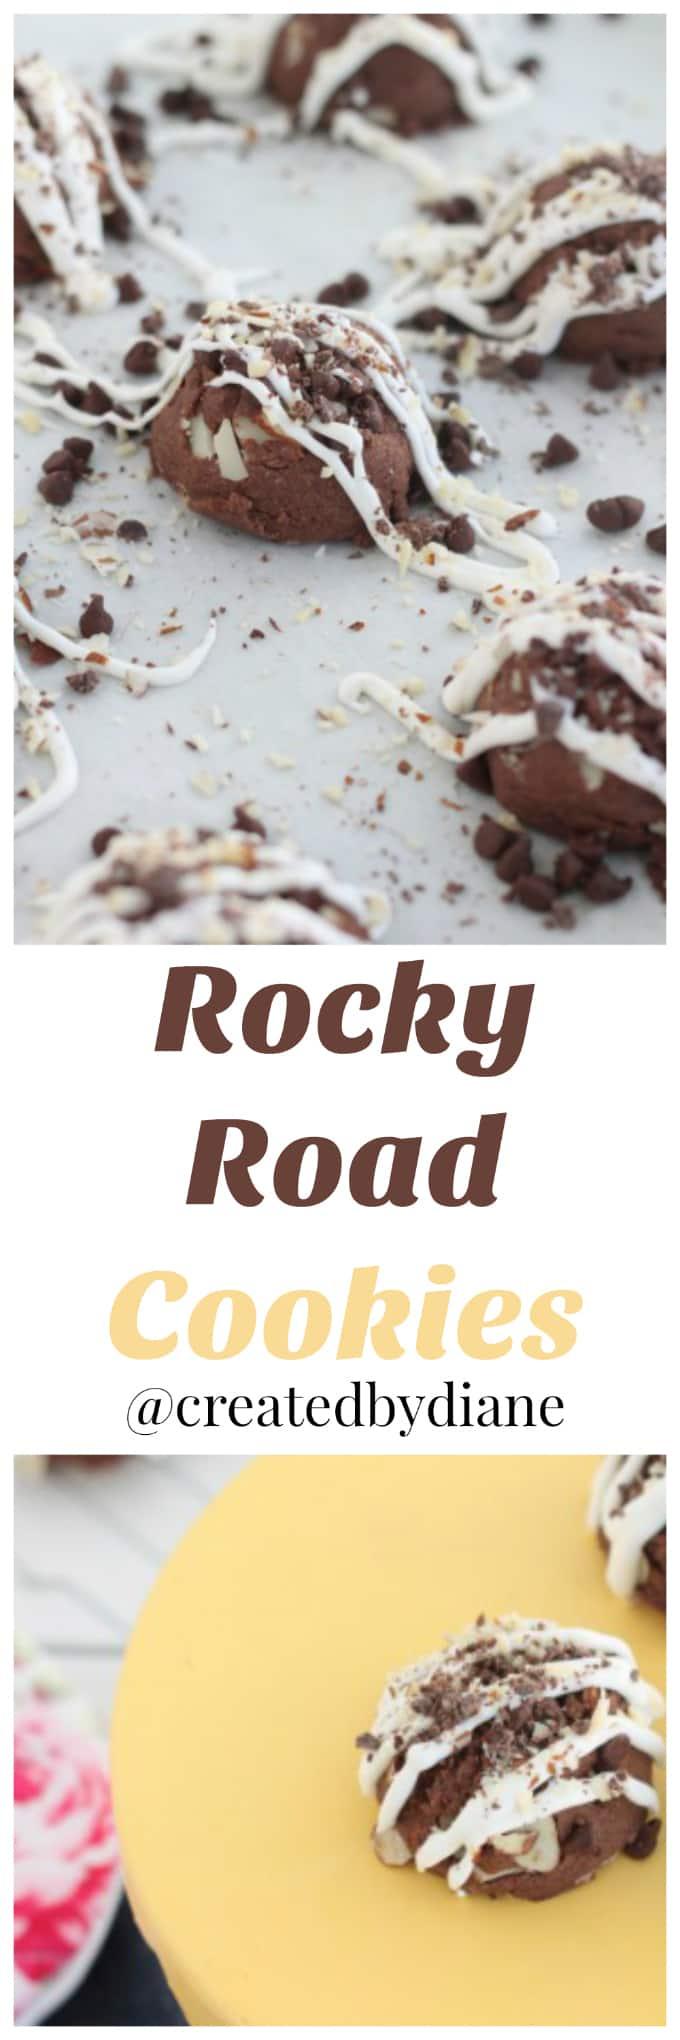 rocky-road-cookies-createdbydiane